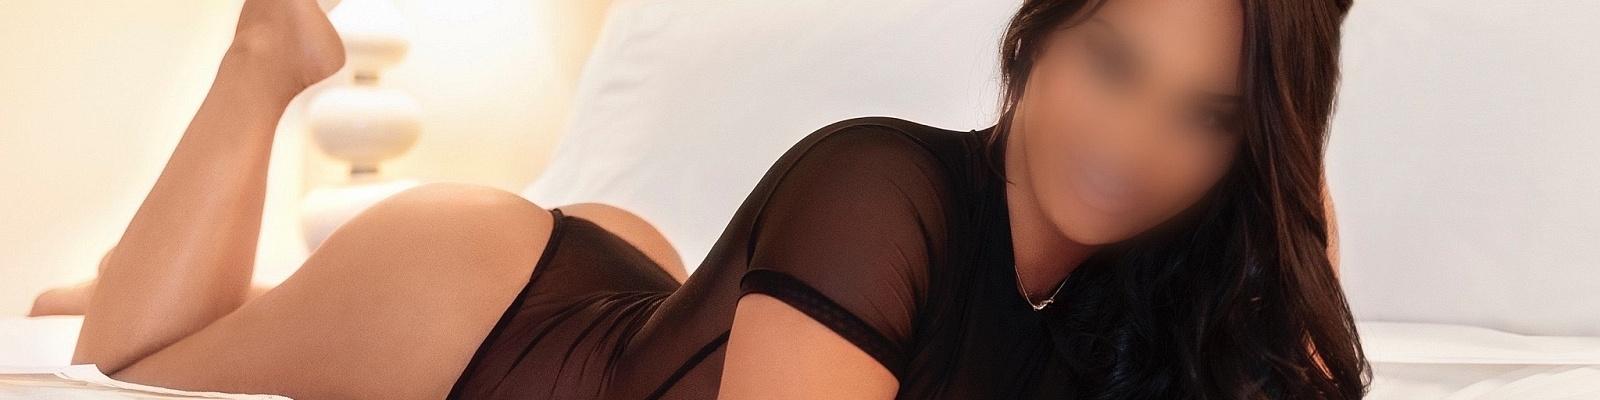 Eva Fan's Cover Photo